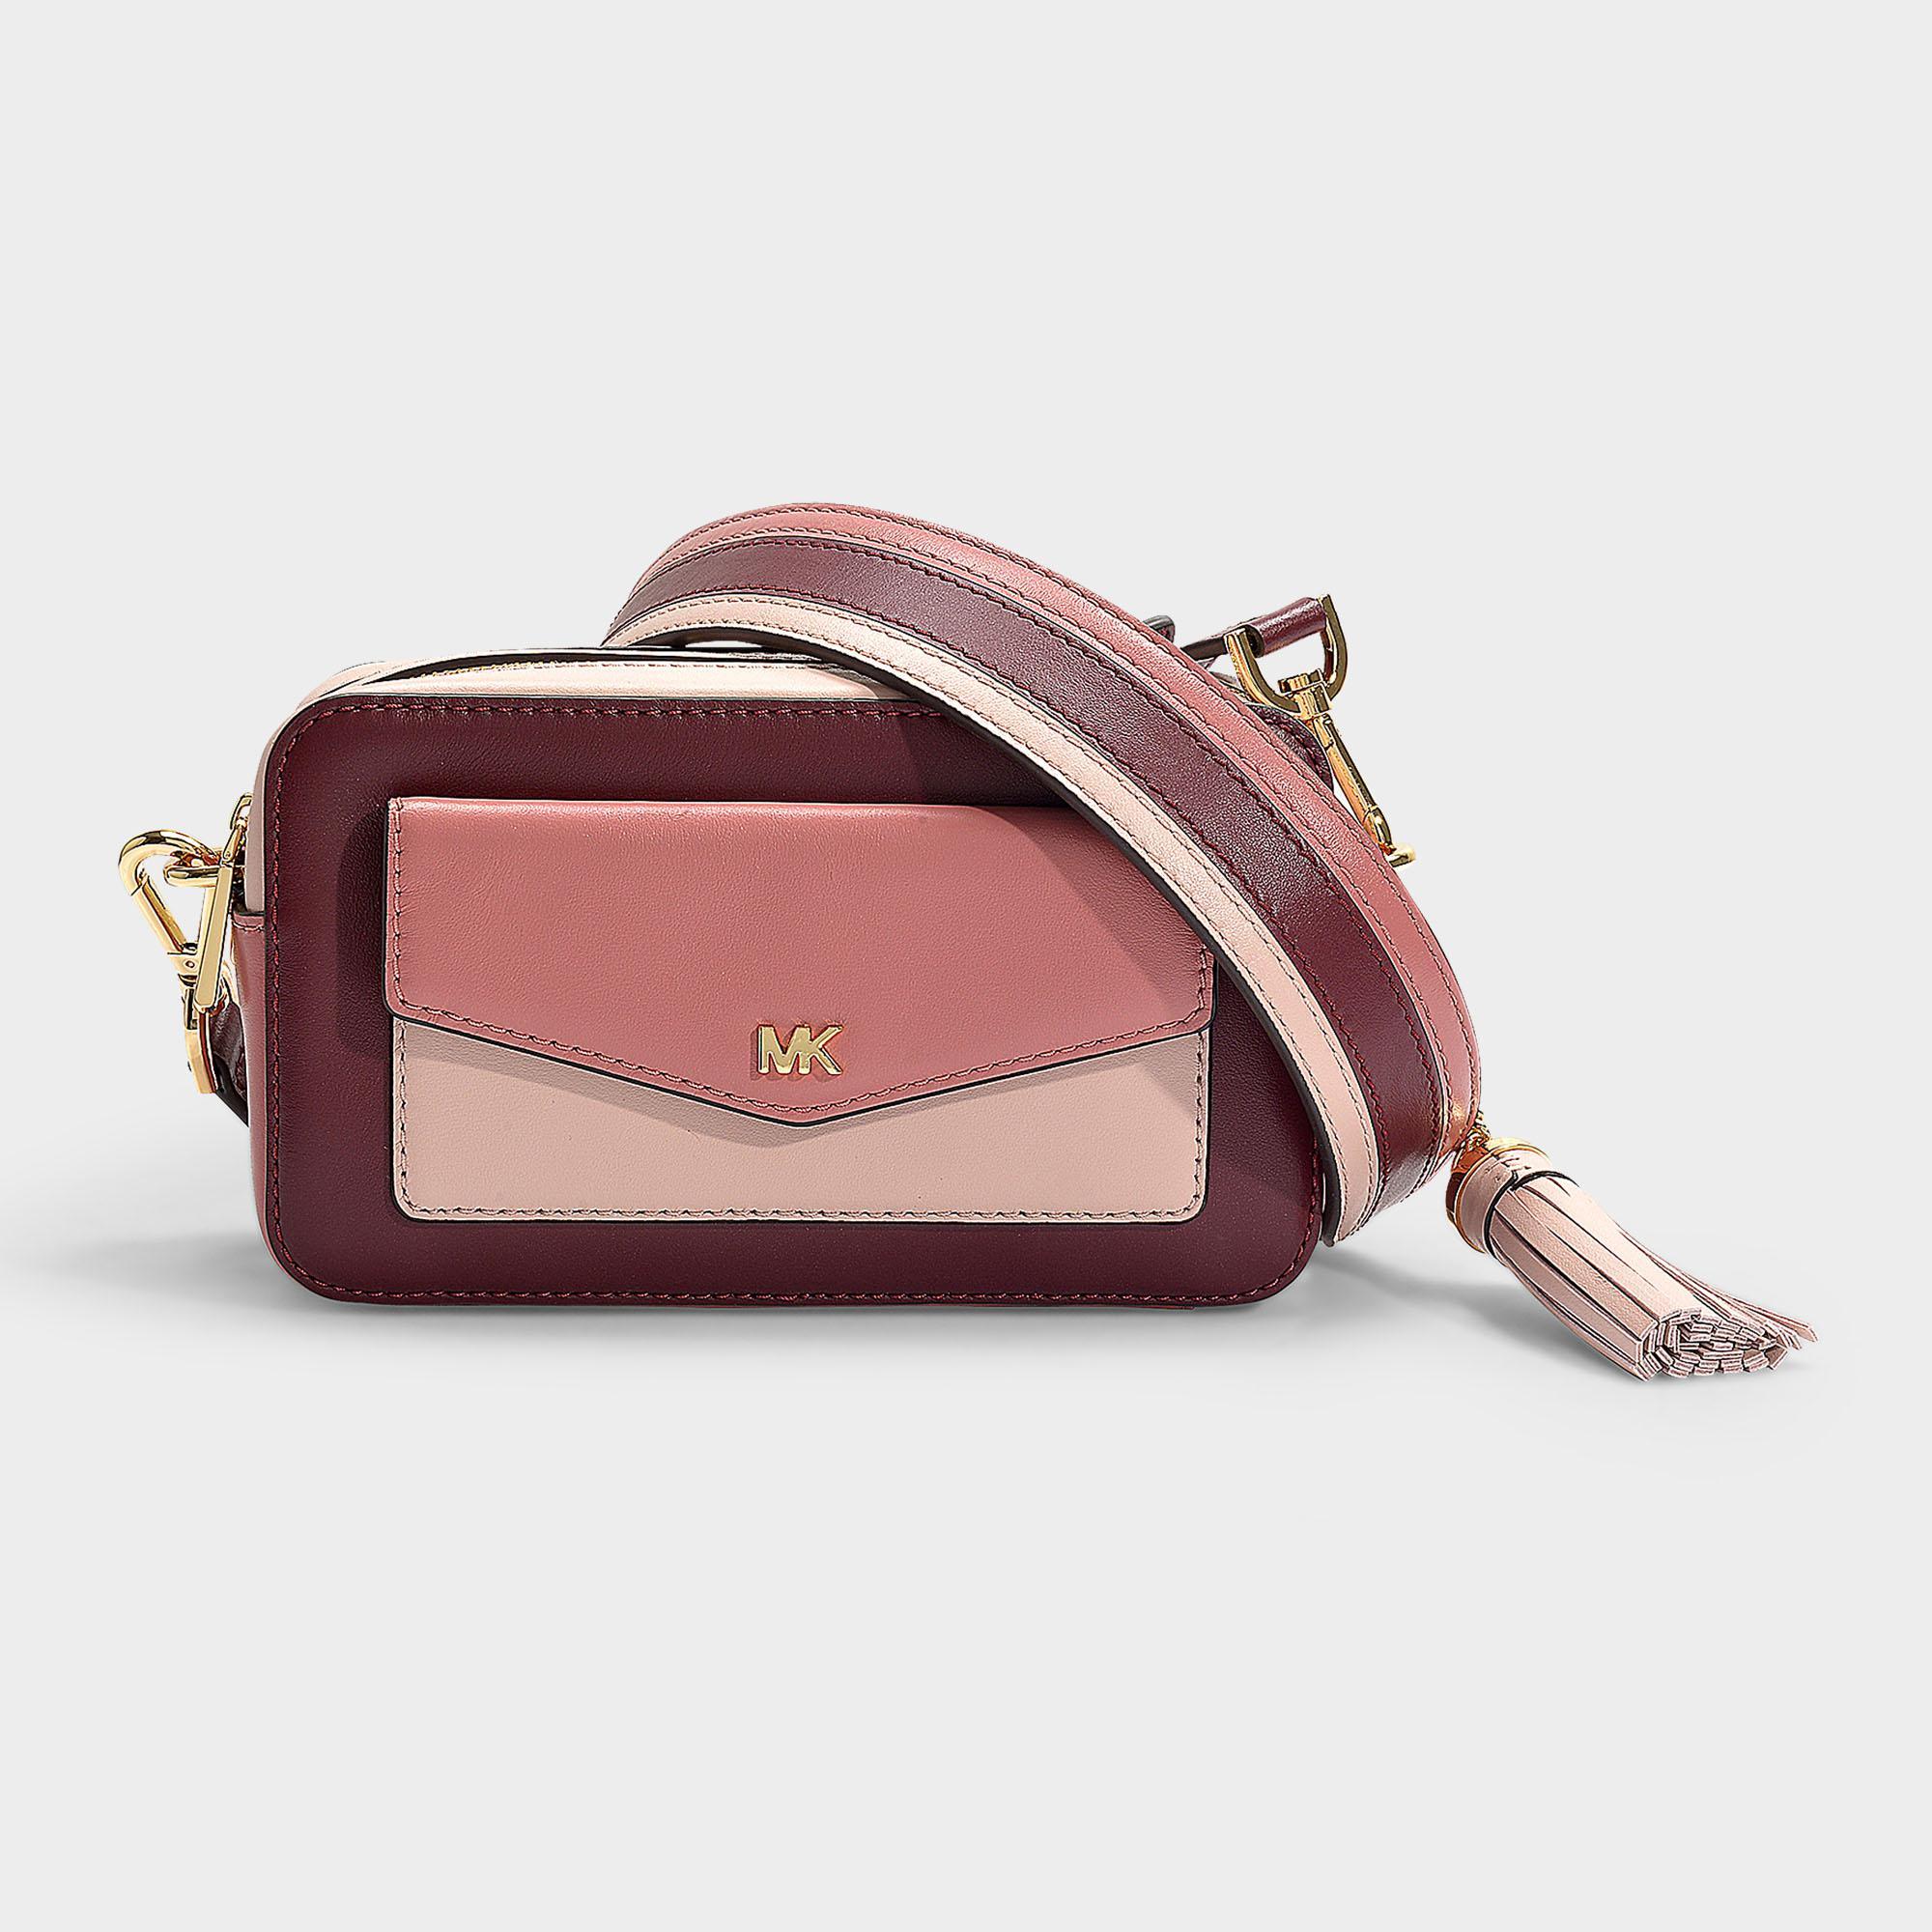 234563d77e15 Lyst - MICHAEL Michael Kors Pocket Camera Bag in Pink - Save 19%